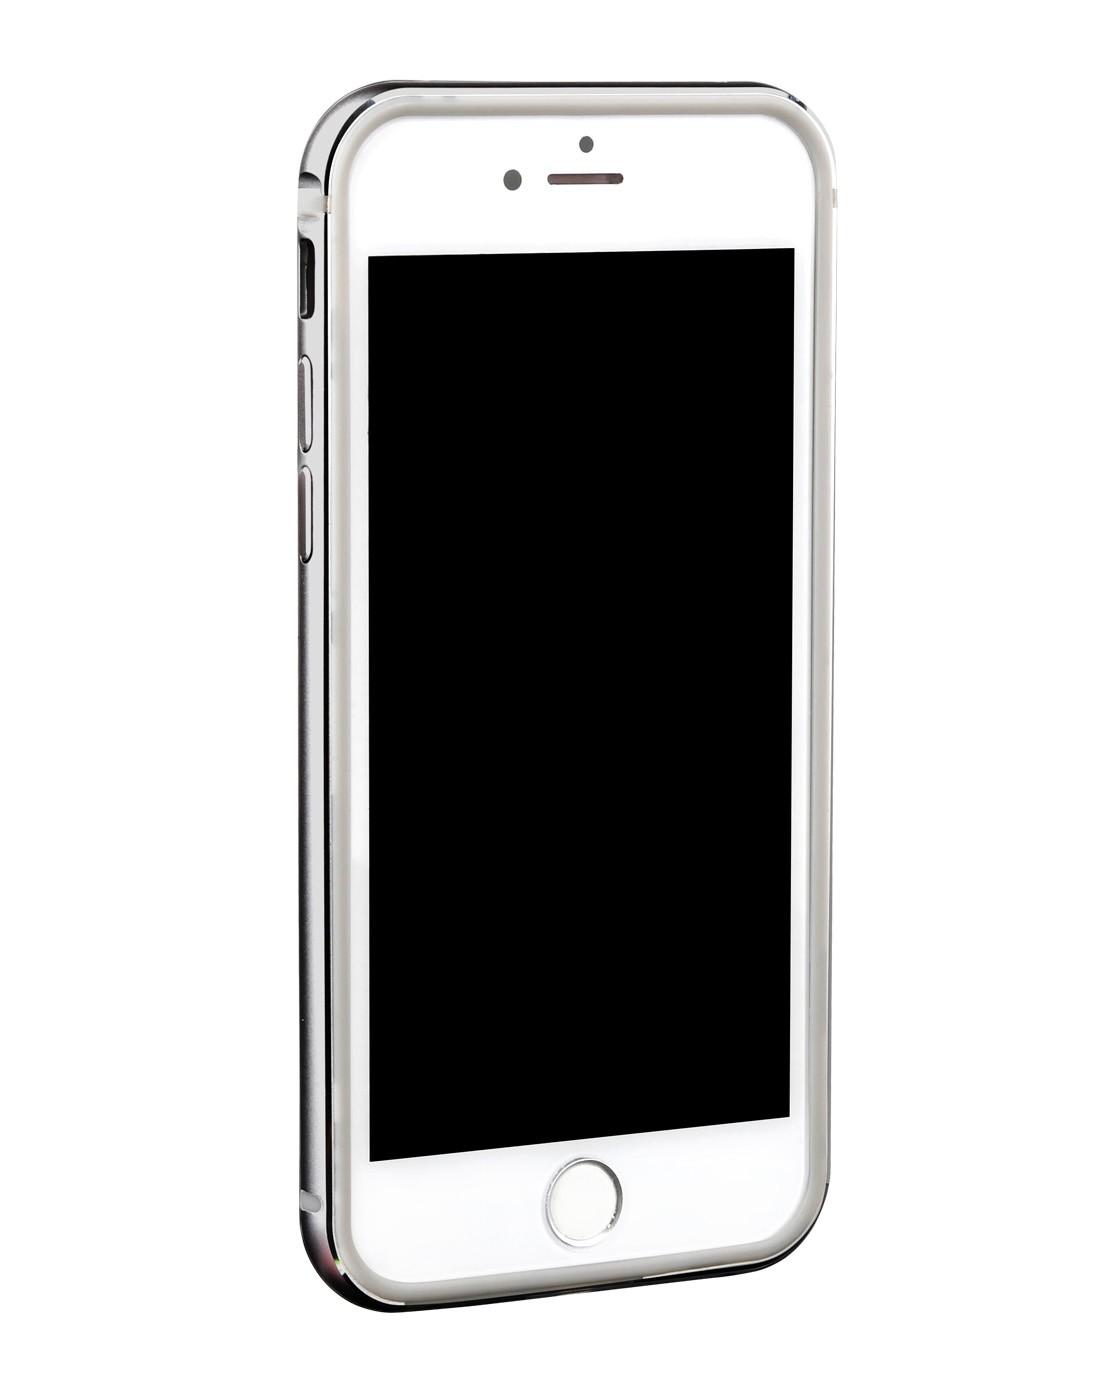 > iphone6灰色边框内套tpu边框